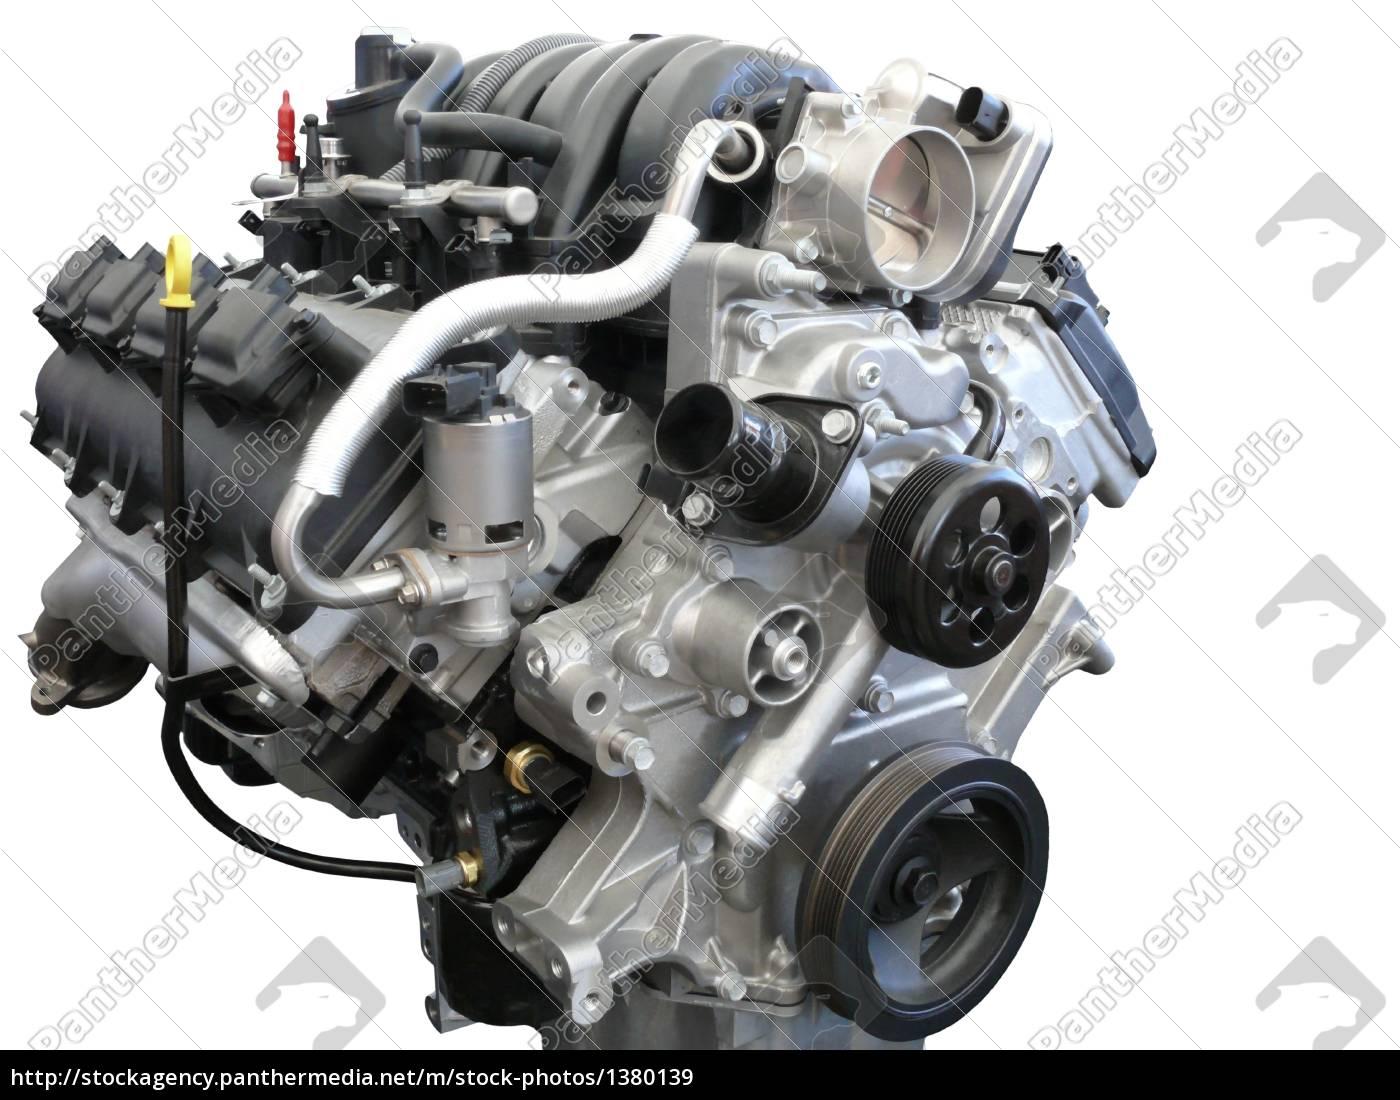 Automotor - Lizenzfreies Bild - #1380139 - Bildagentur PantherMedia